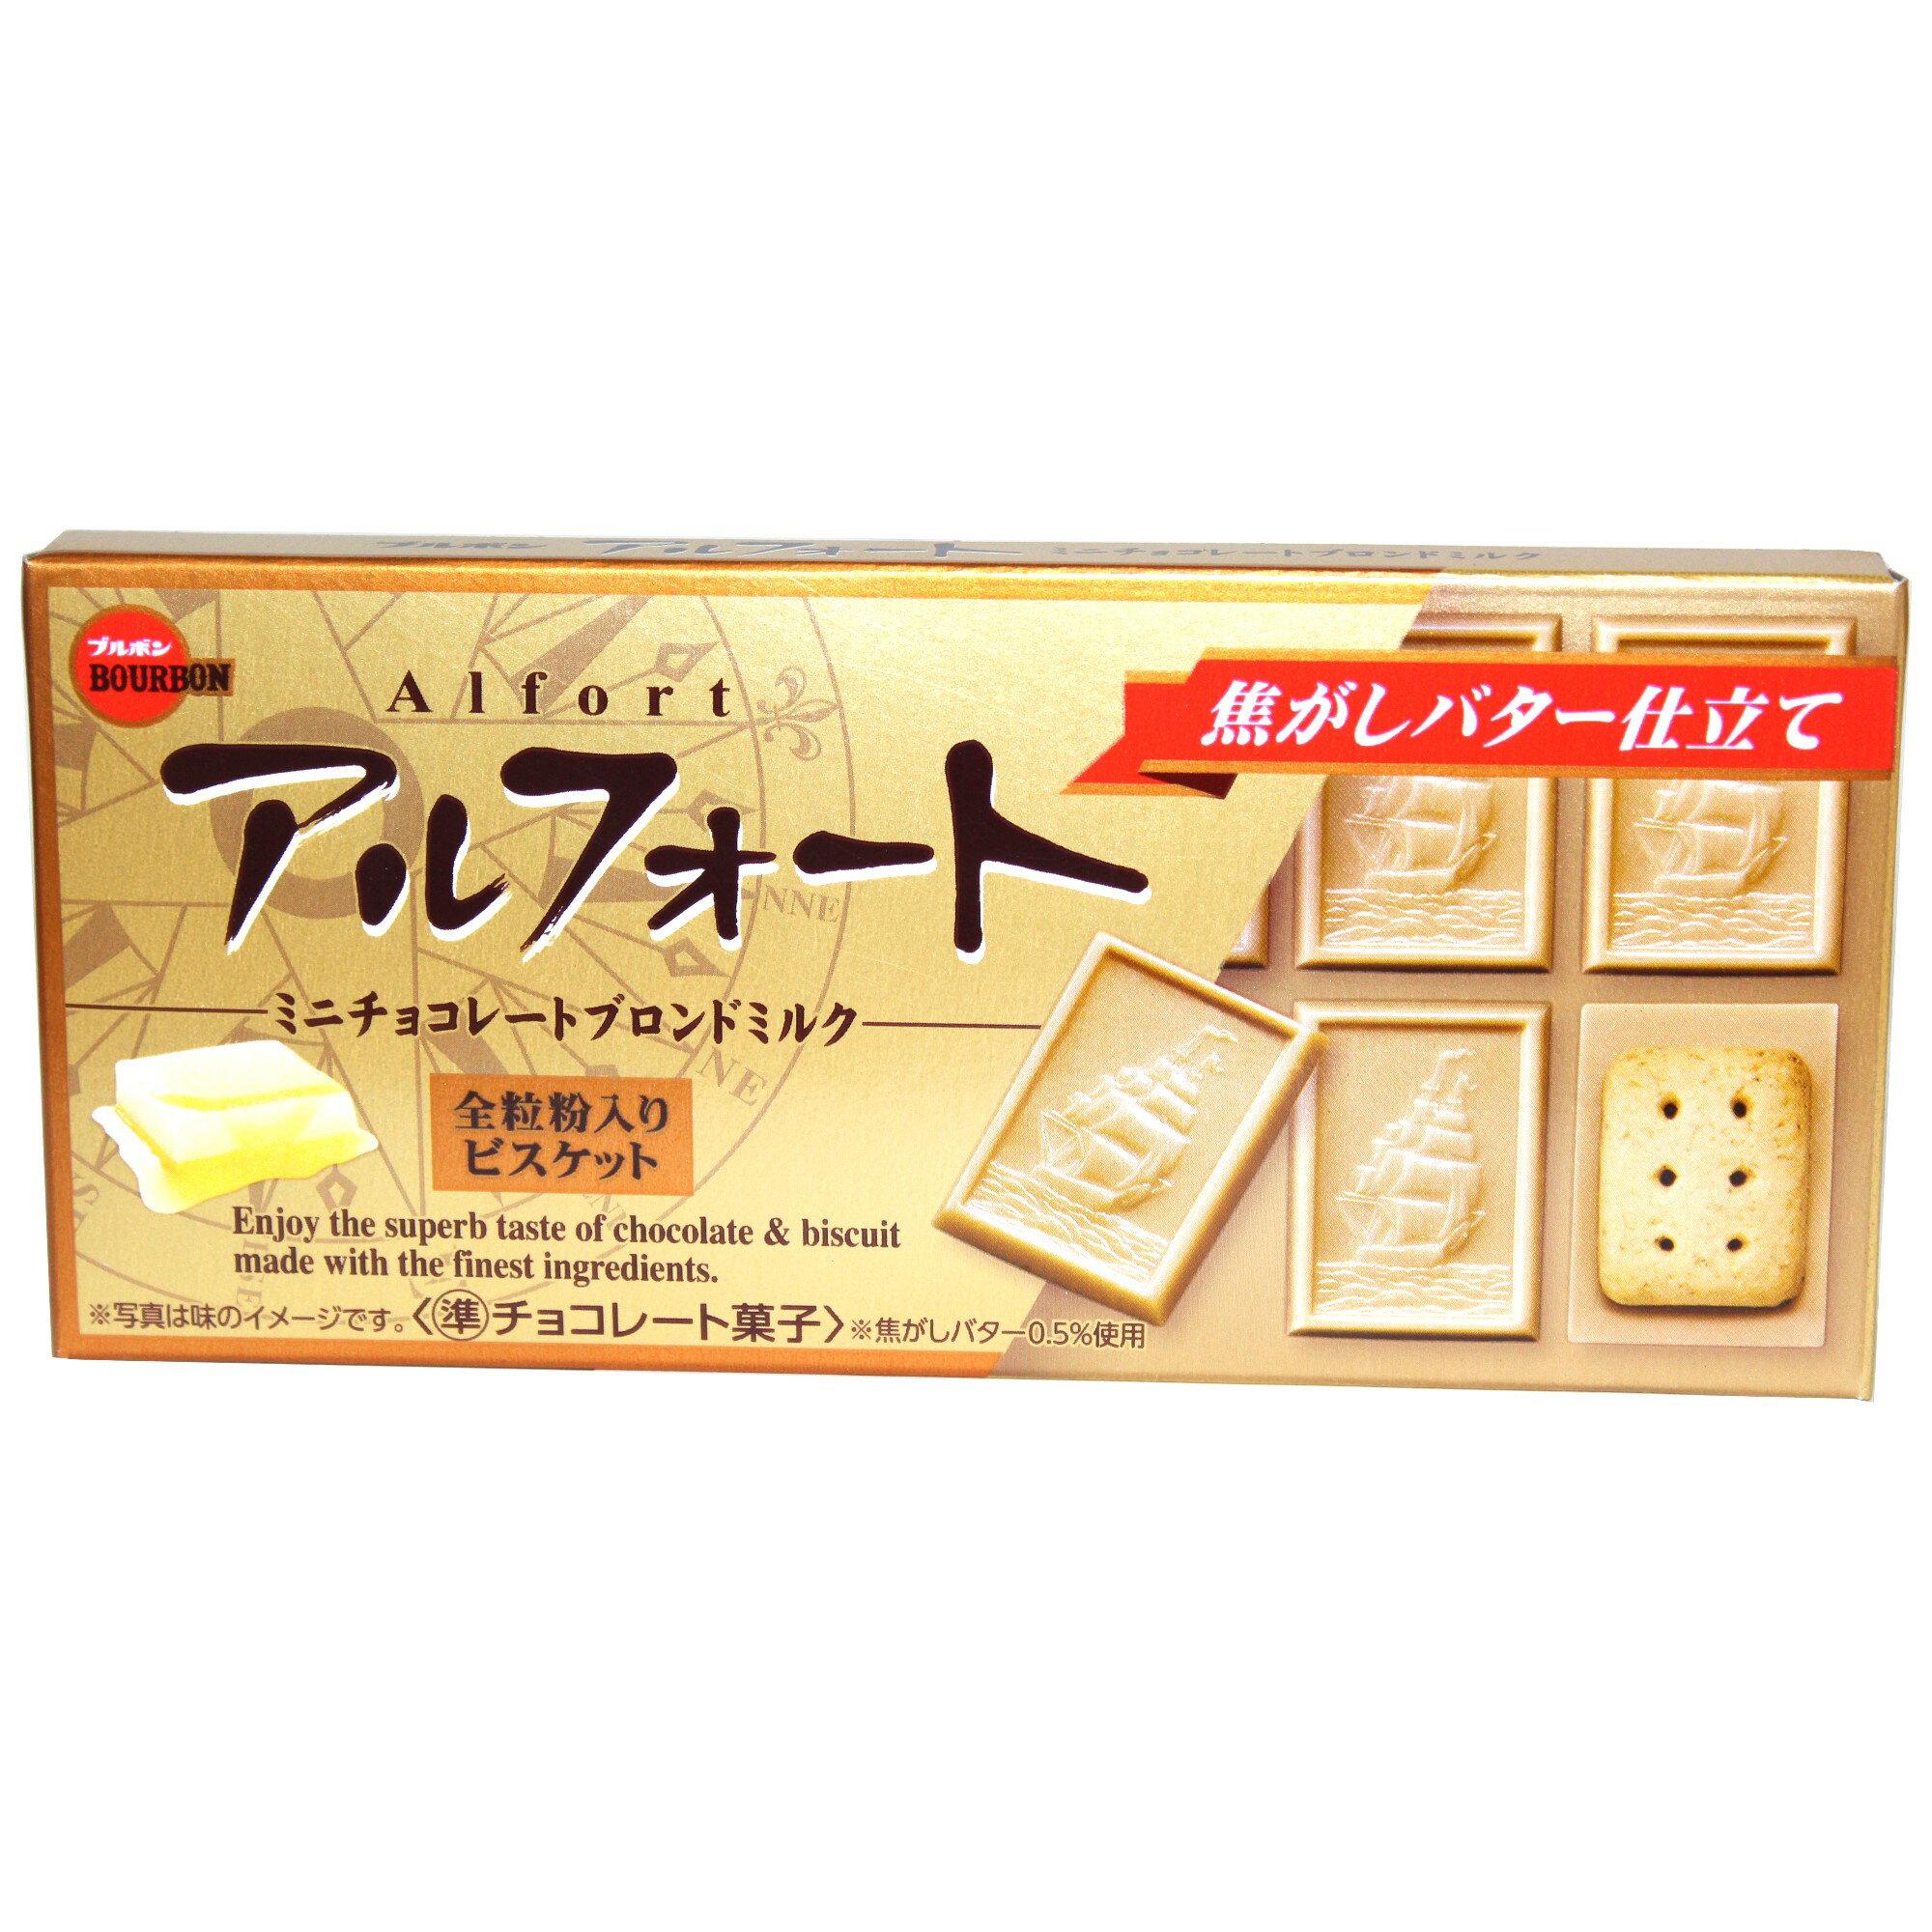 Bourbon 北日本 Alfort 船型金色奶油巧克力餅 55g